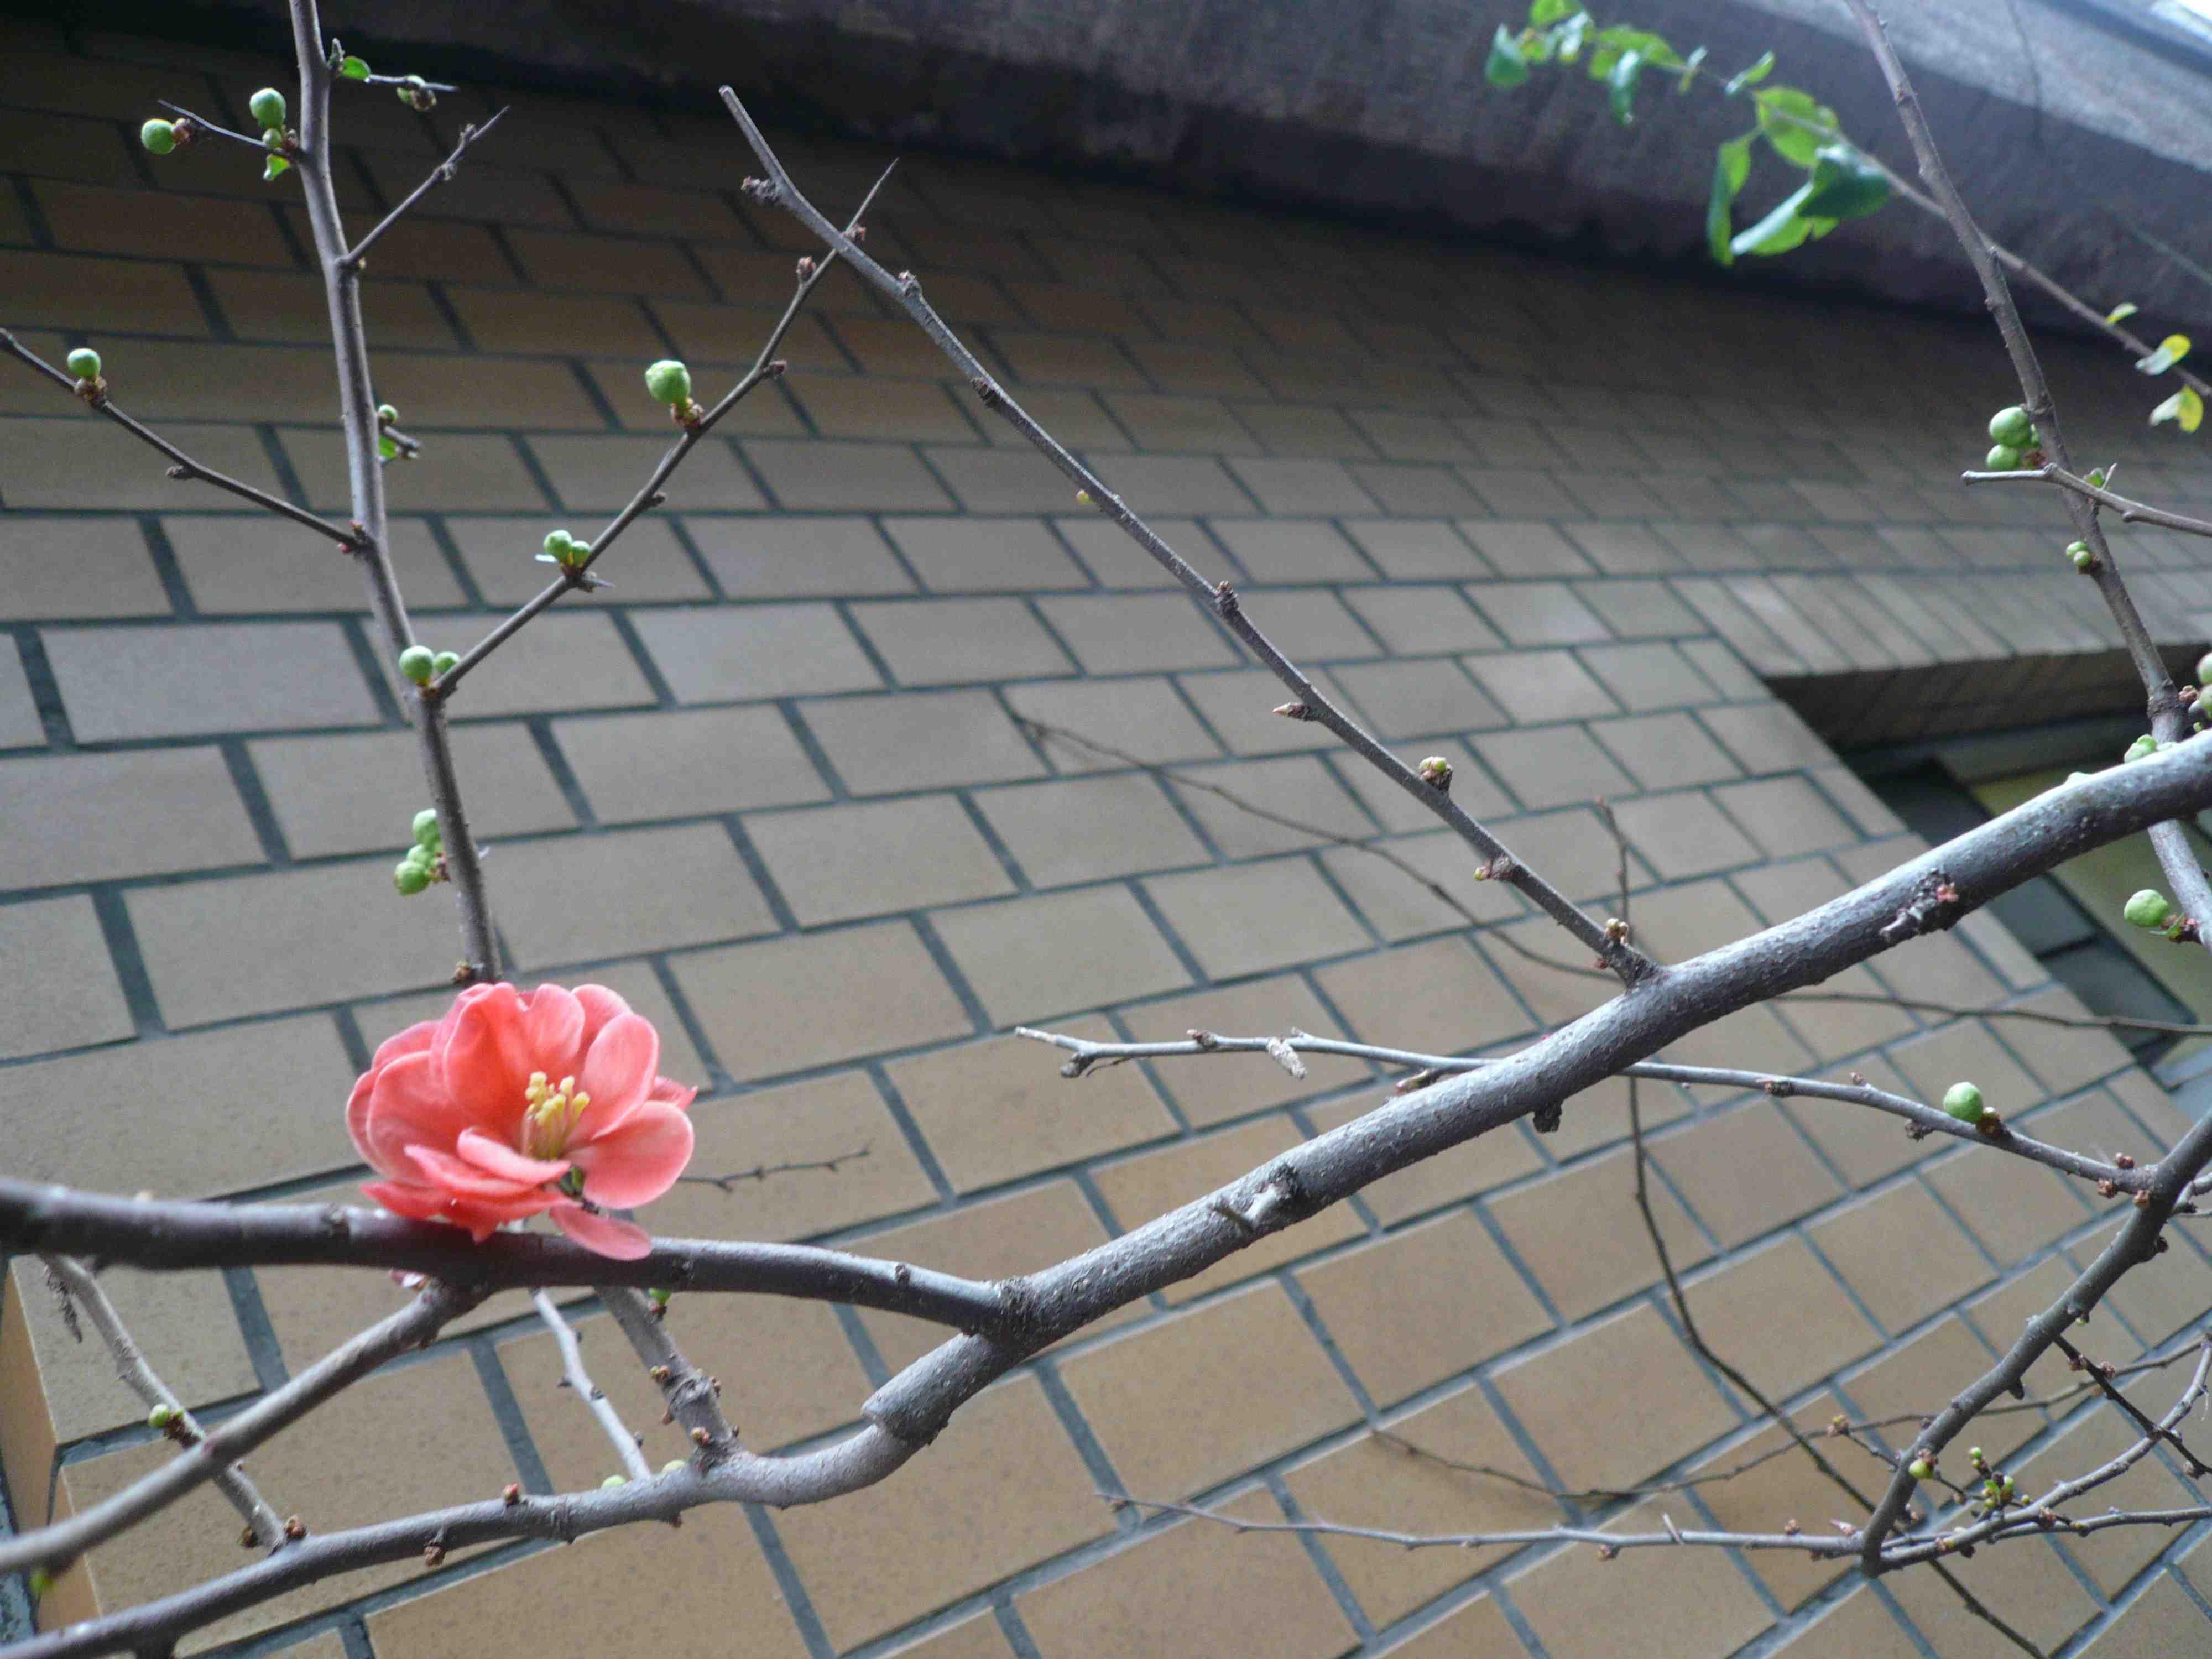 春の予感_b0099226_1431196.jpg